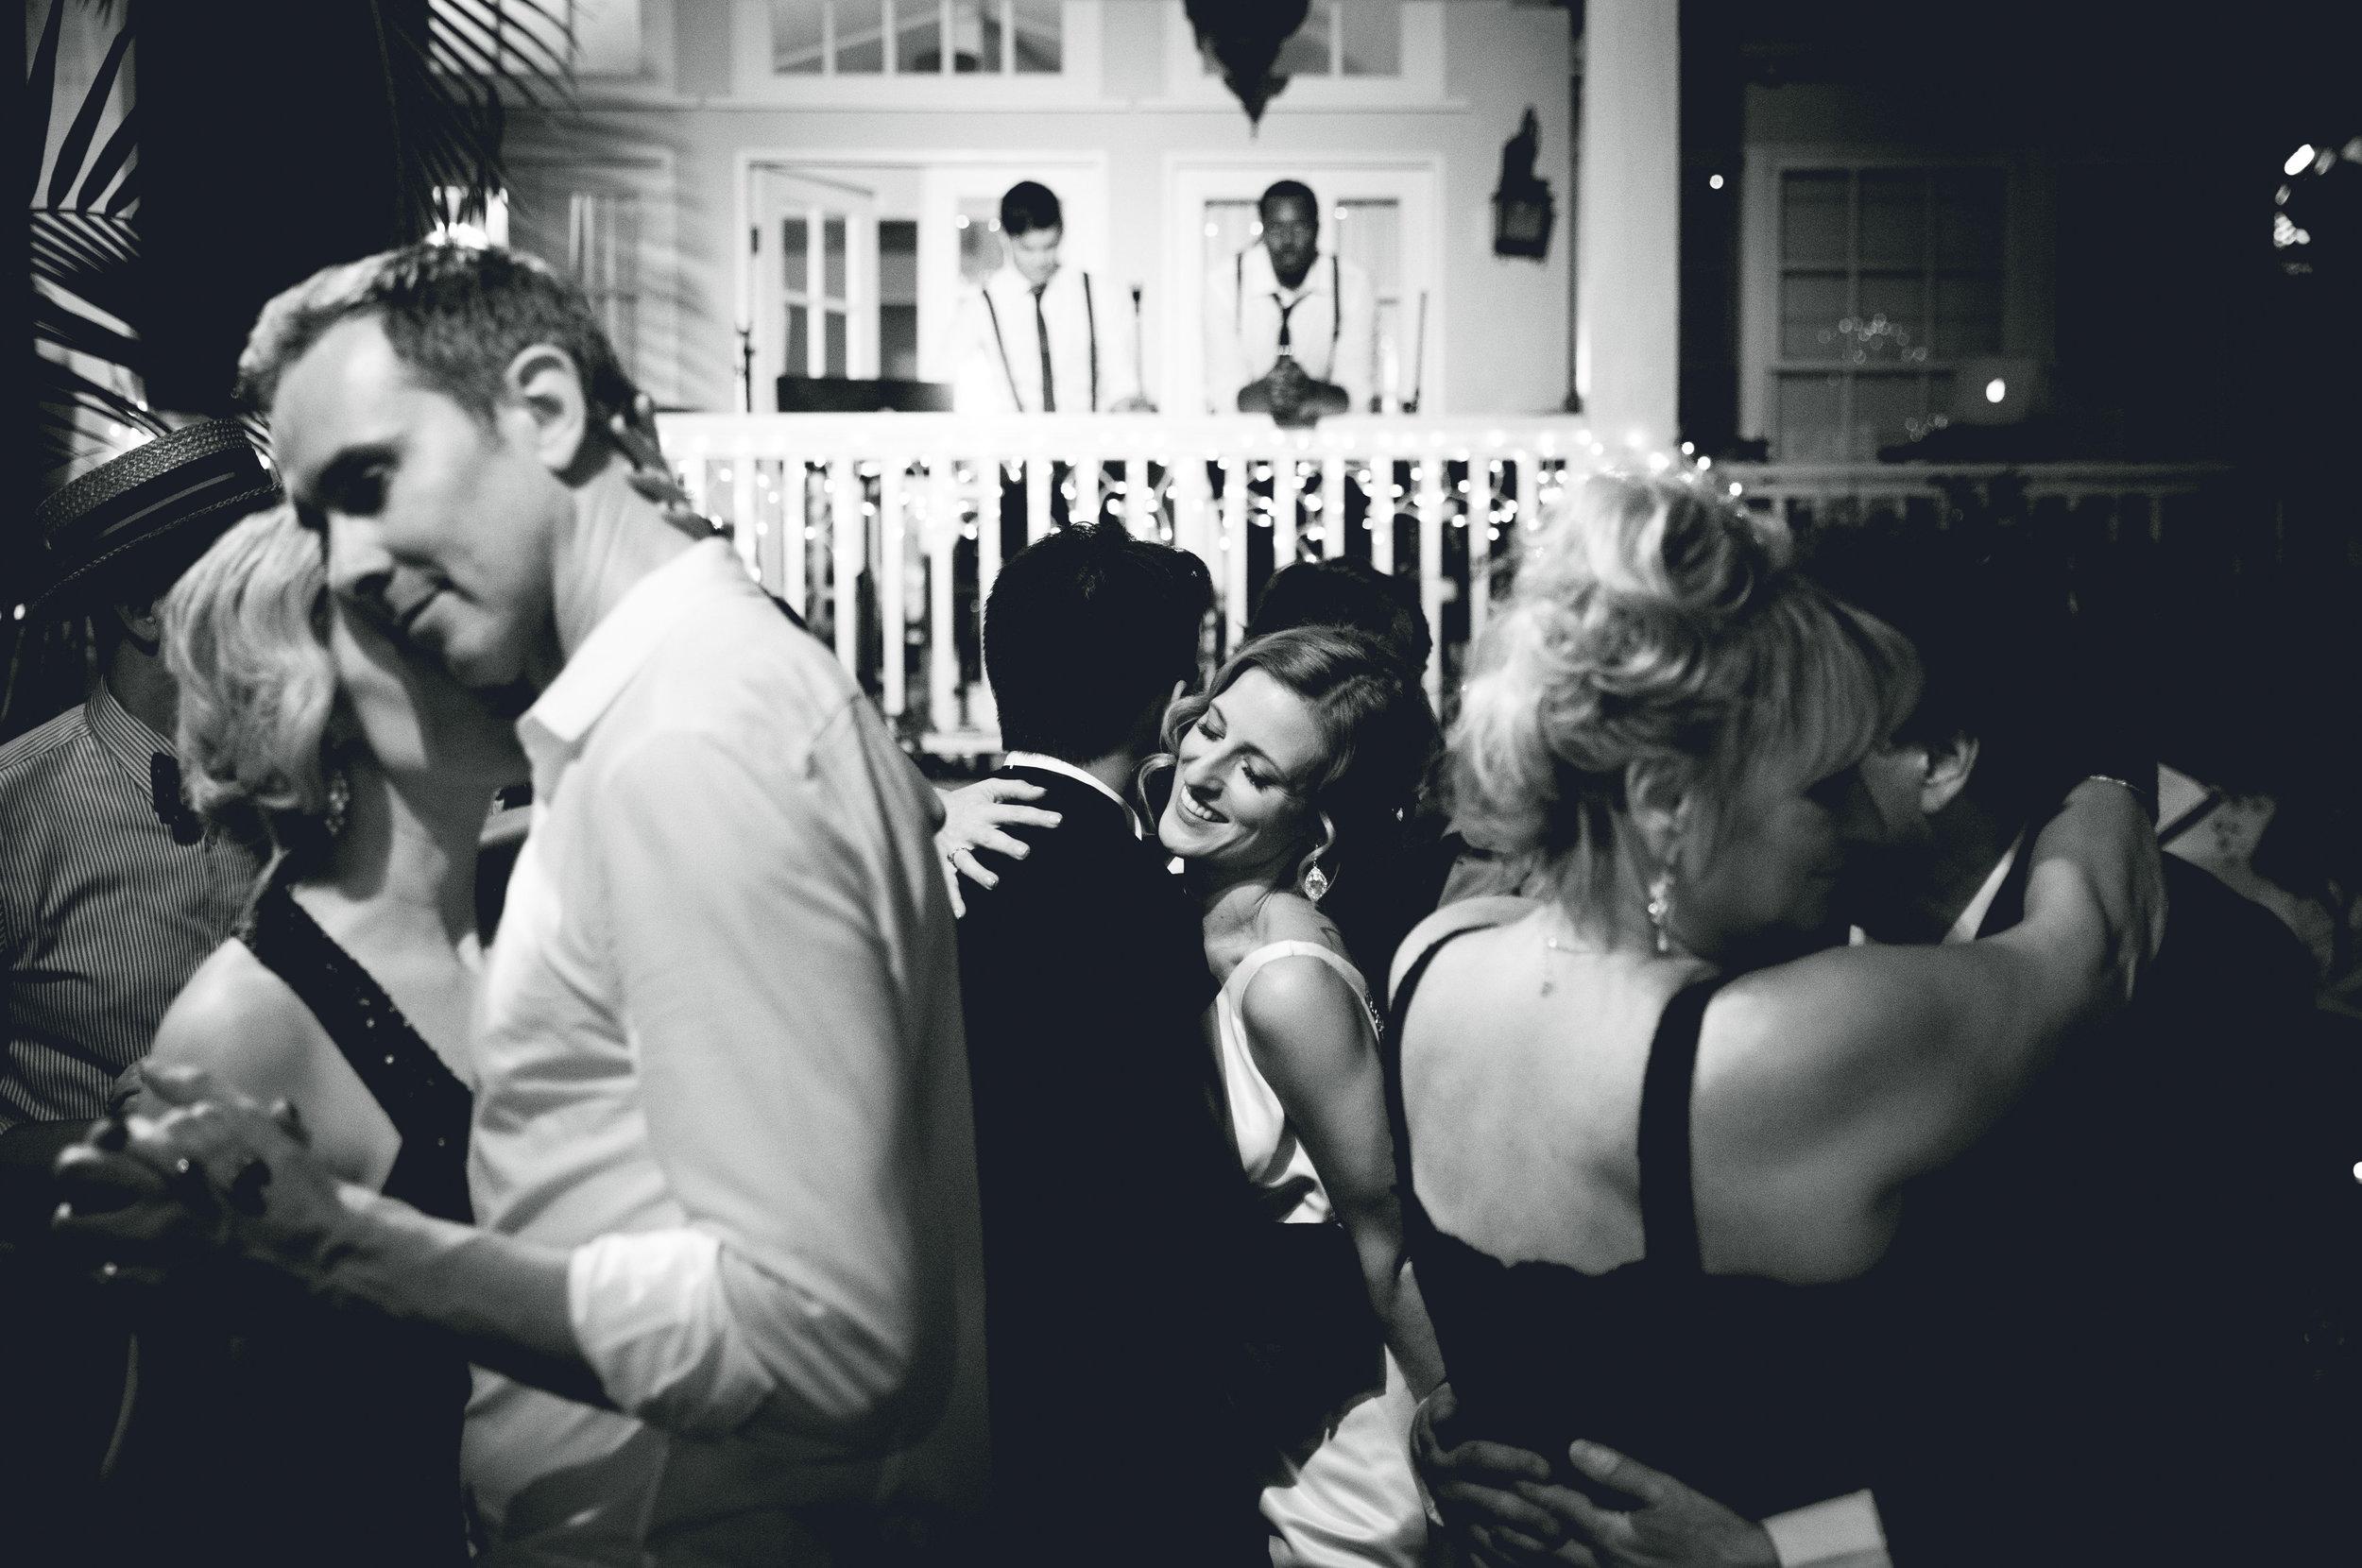 Chris Kristen October 2015 Wedding-Chris Kristen October 2015-0152.jpg